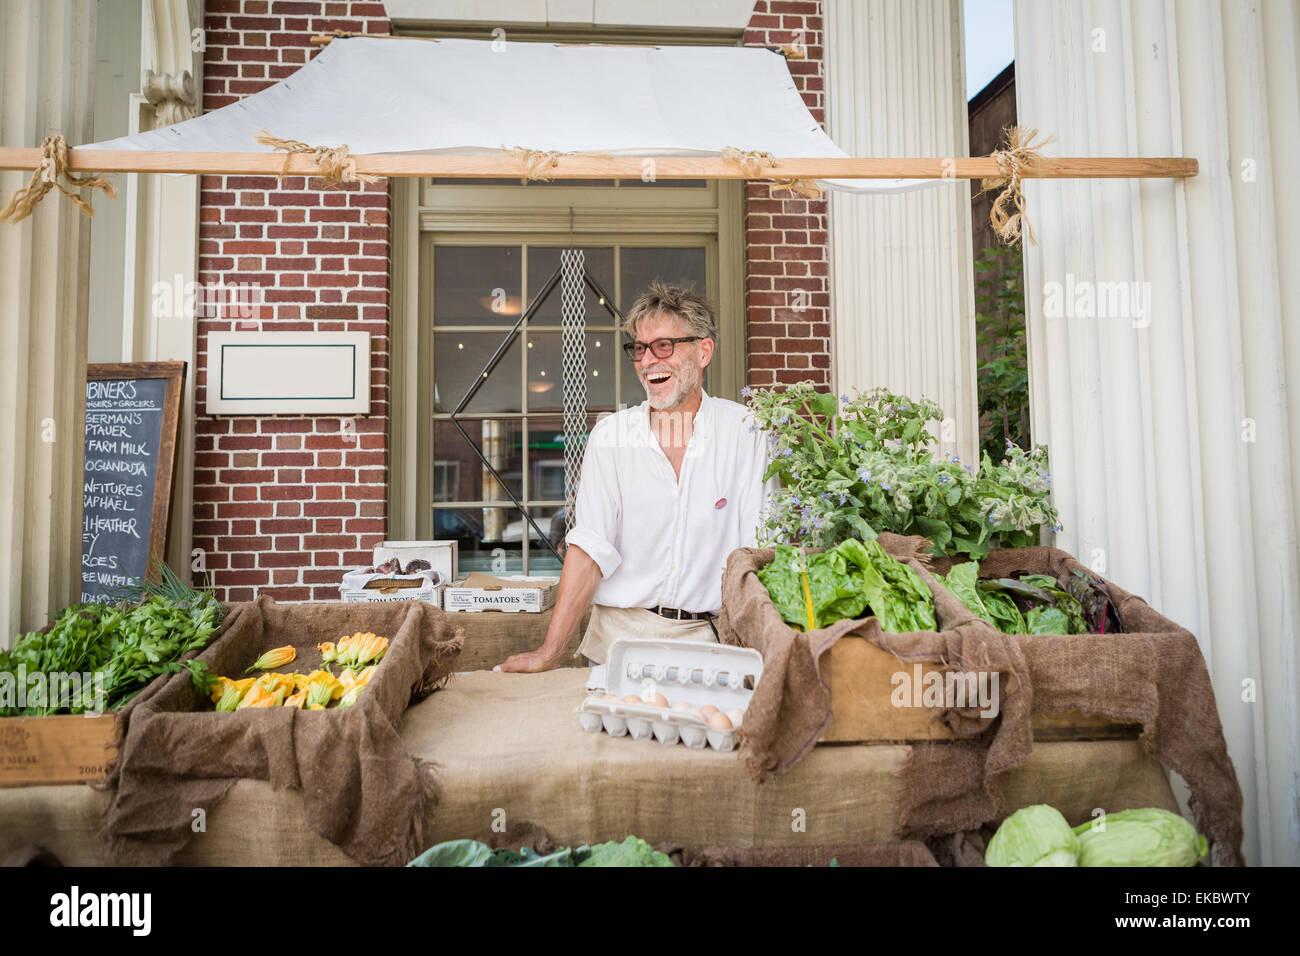 Agricultor vendiendo huevos y verduras orgánicas en calada almacén exterior Imagen De Stock